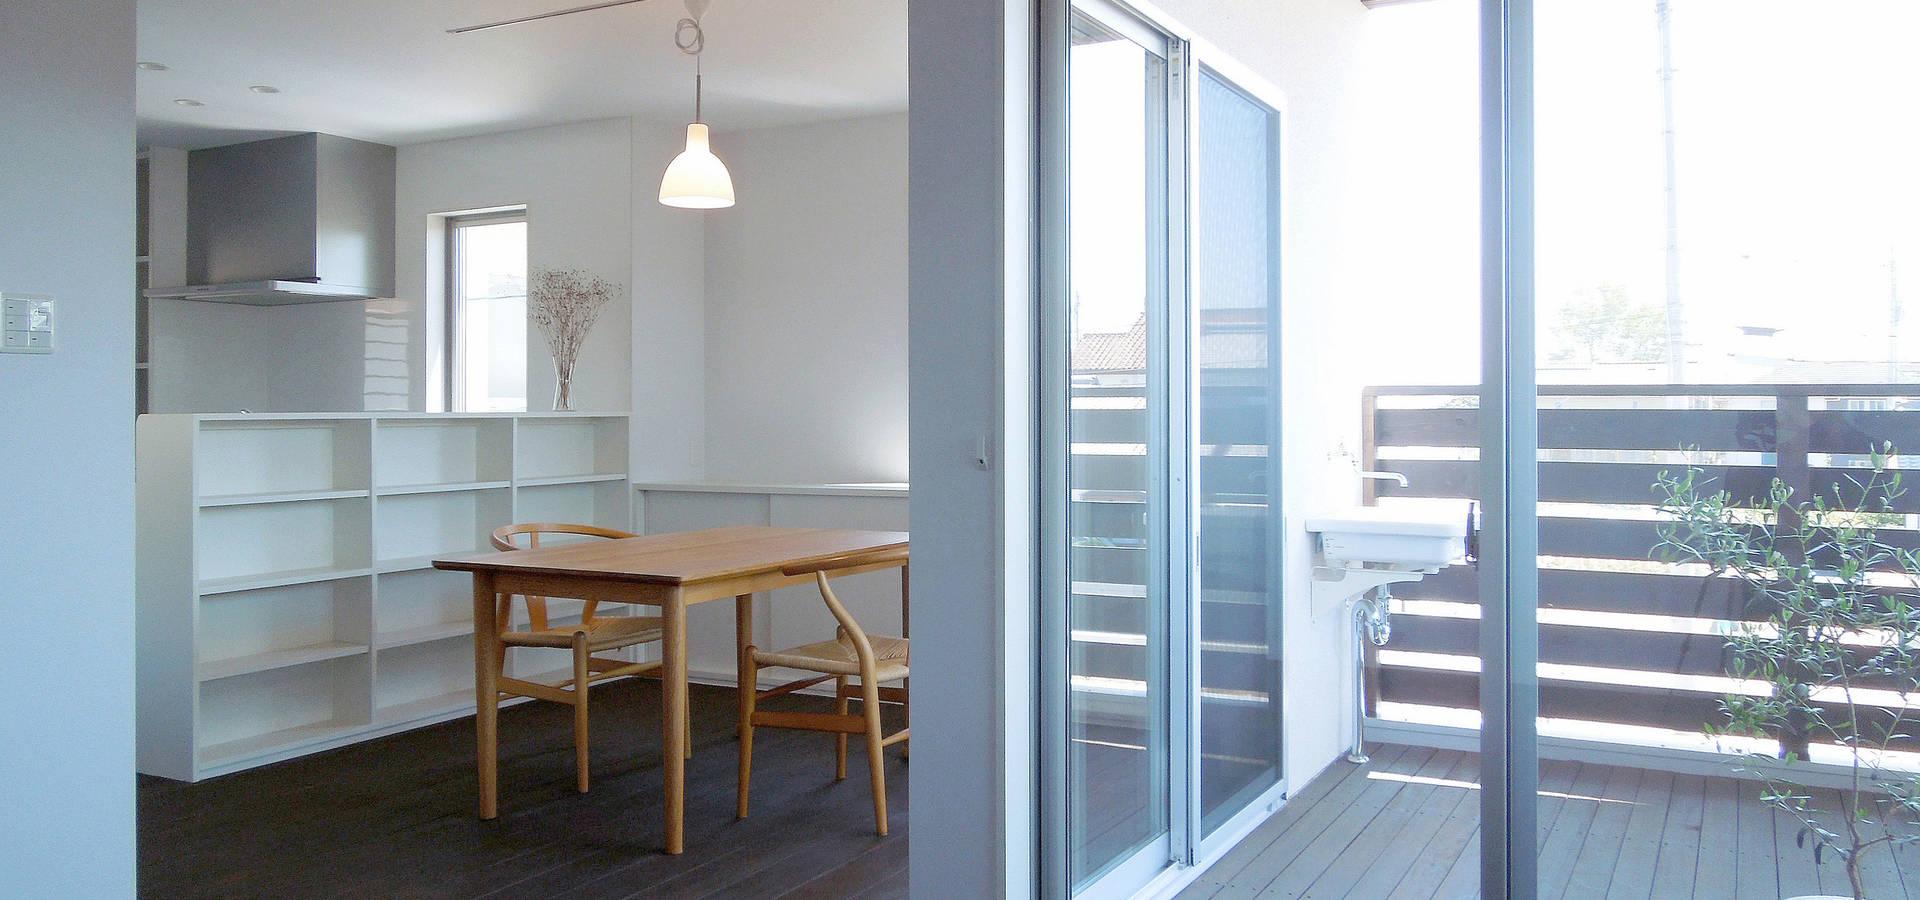 wada architectural  design office 和田設計